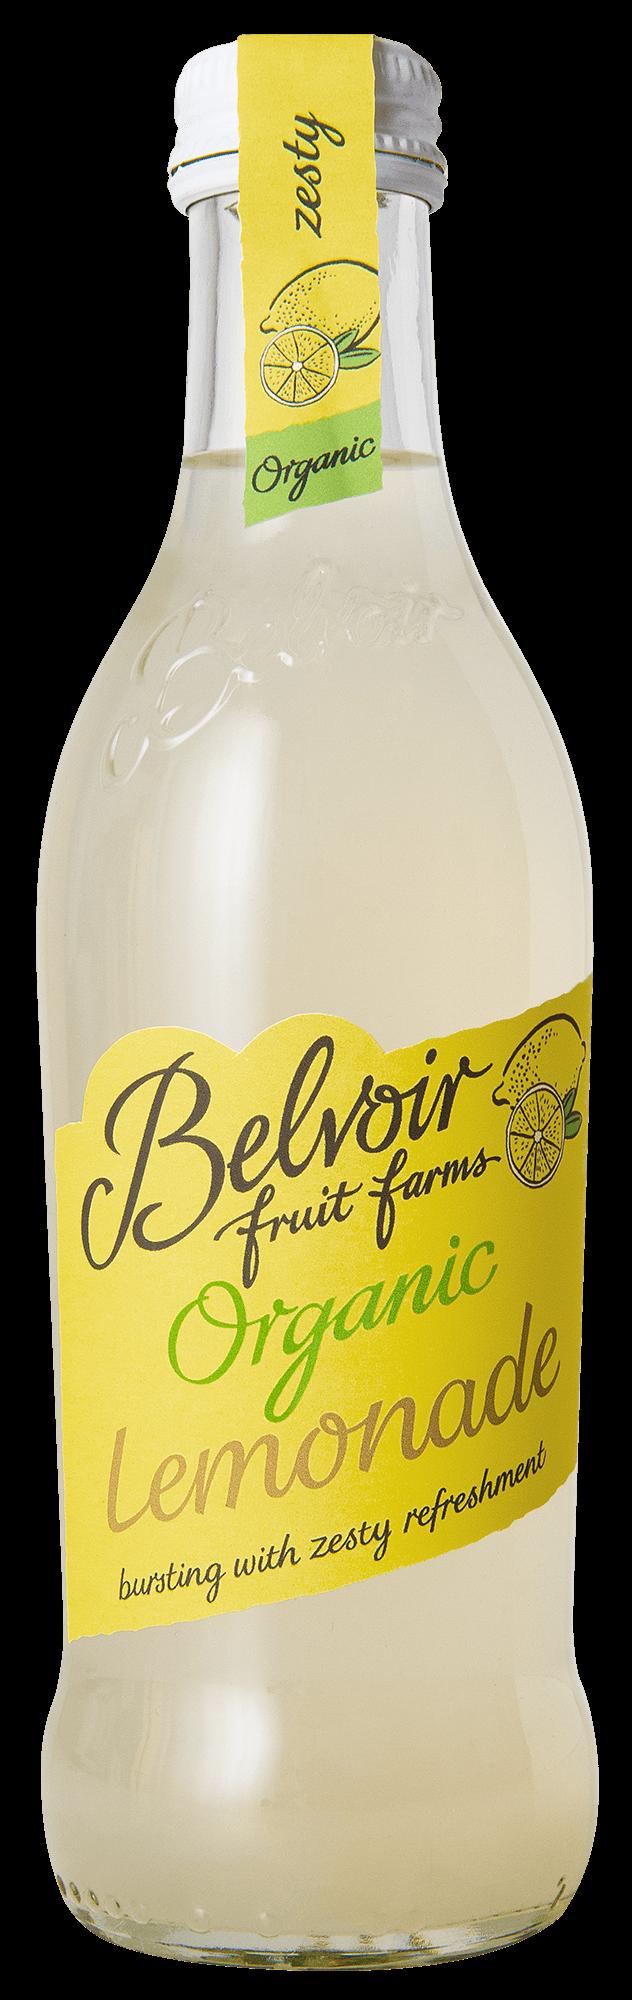 Belvoir Organic Handmade Lemonade